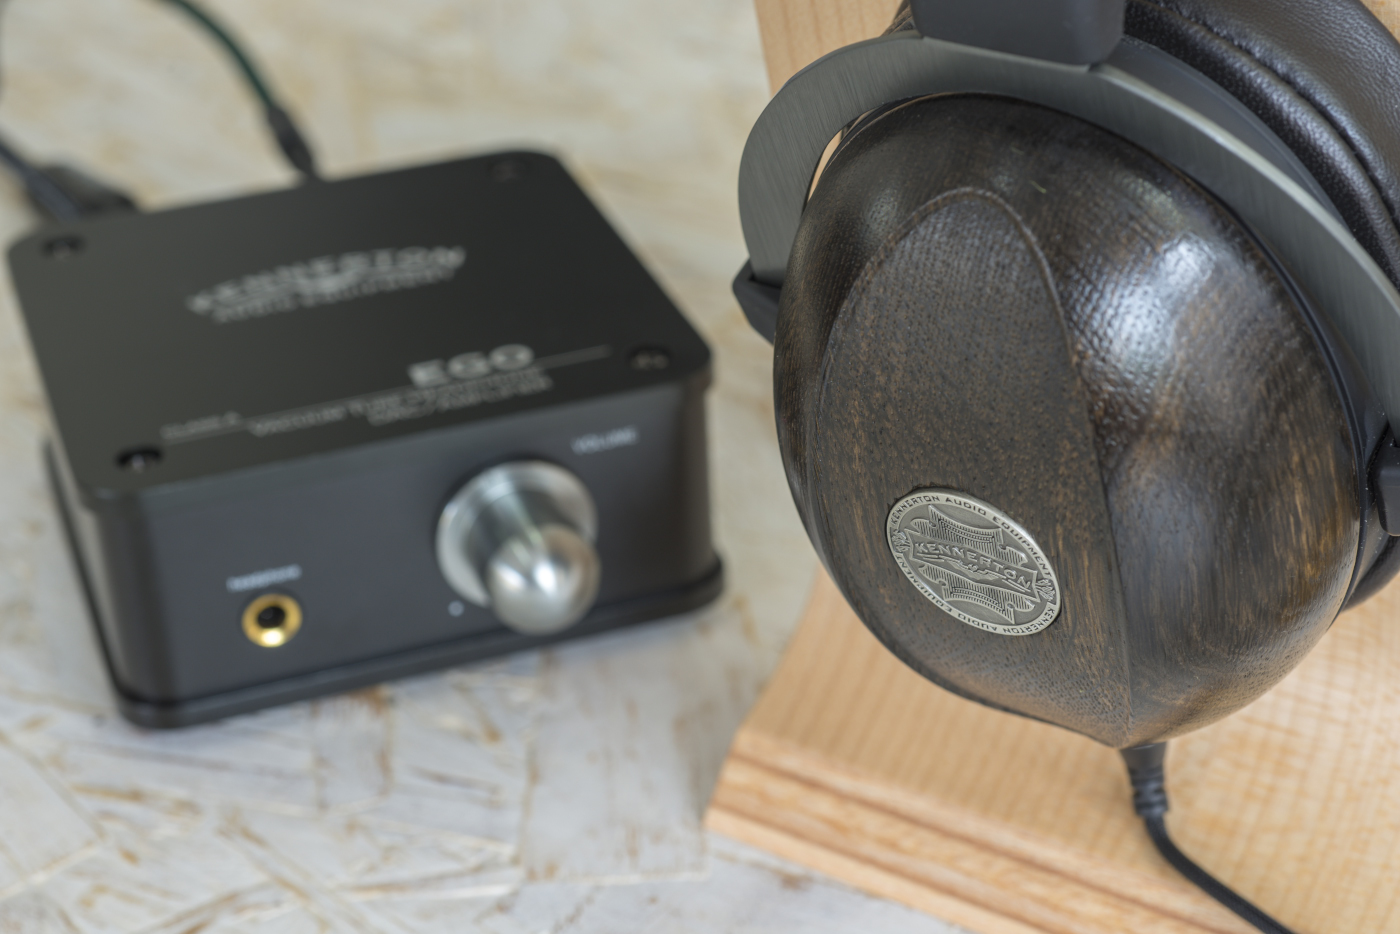 Kennerton Magister Headphones and EGO DAC & Headphone Amplifier